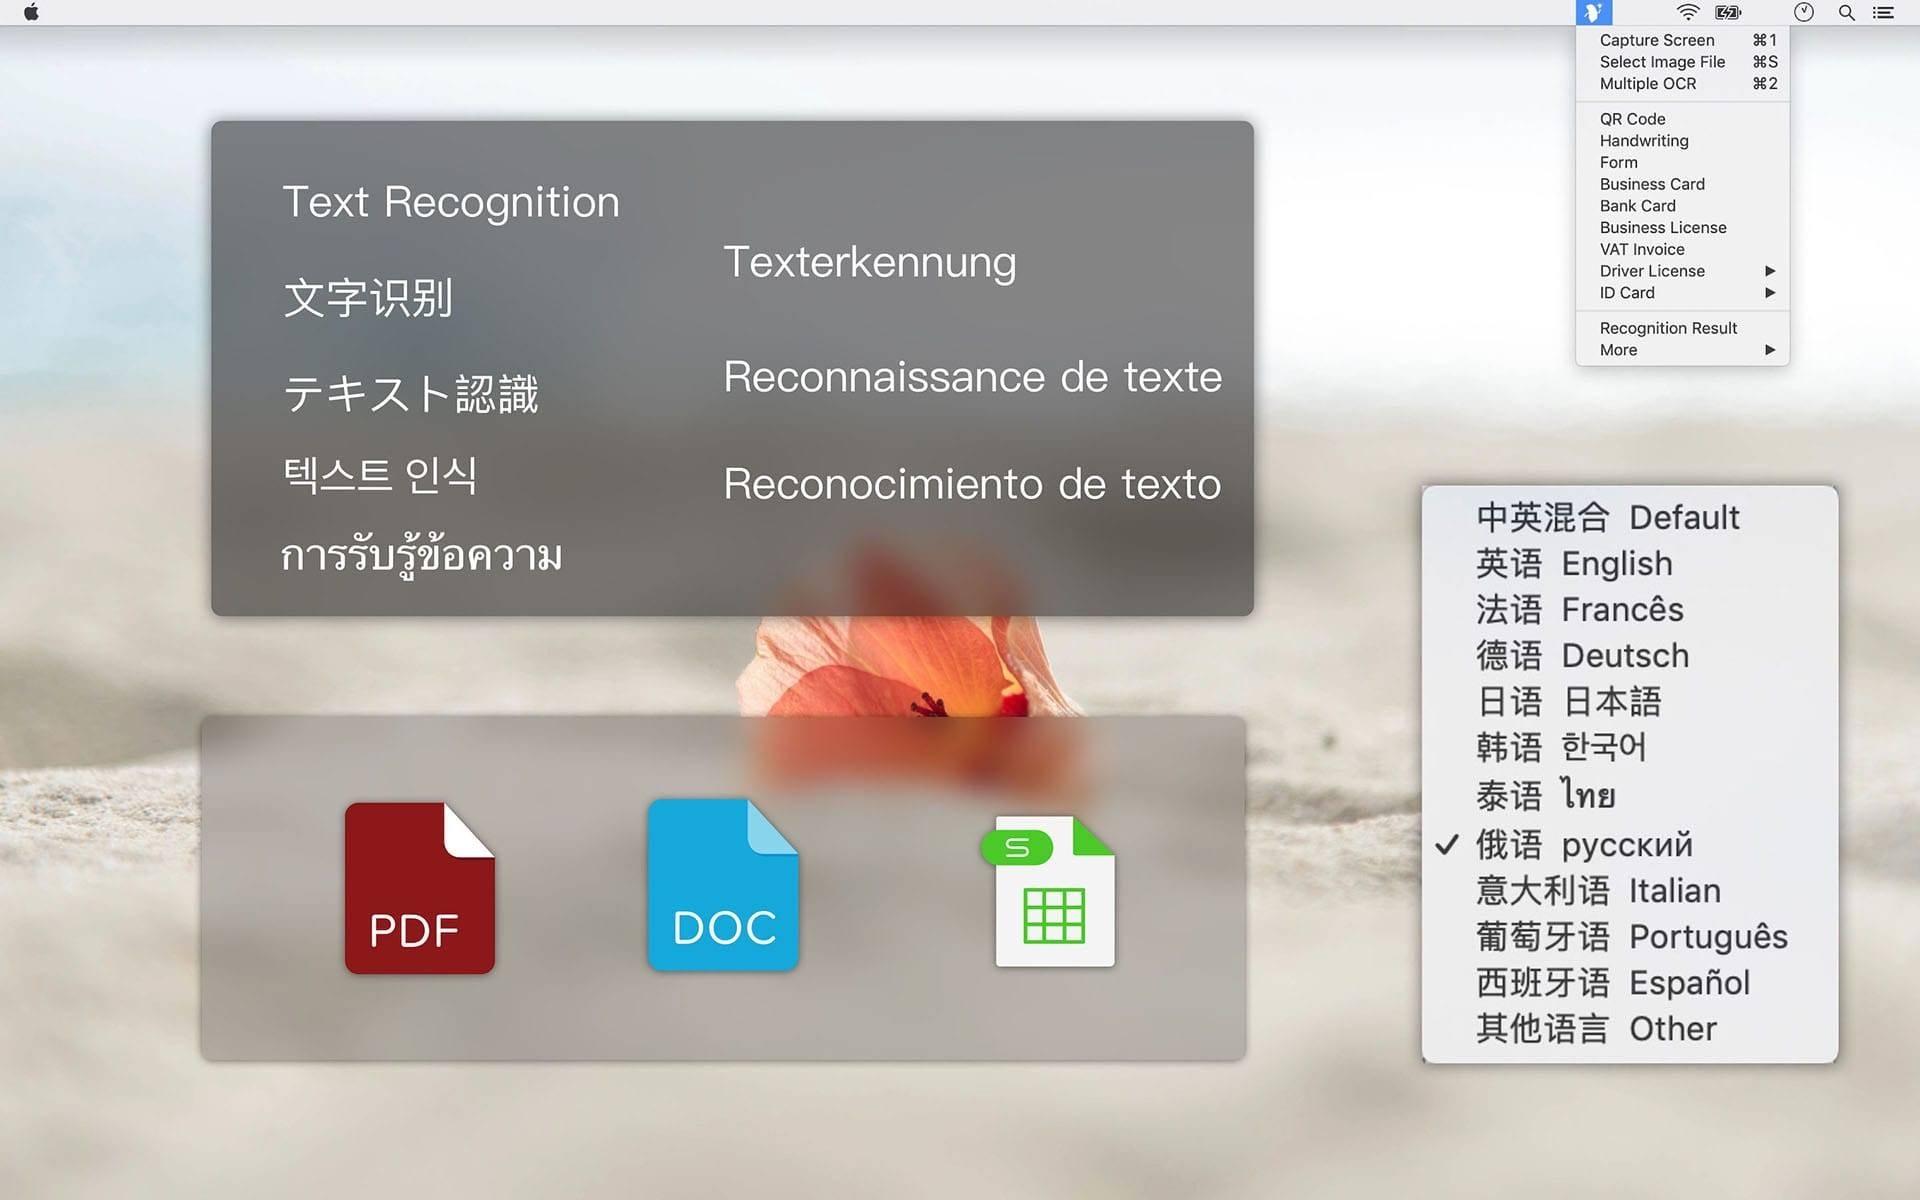 Text Scanner 1.3.8 文字扫描识别工具-马克喵